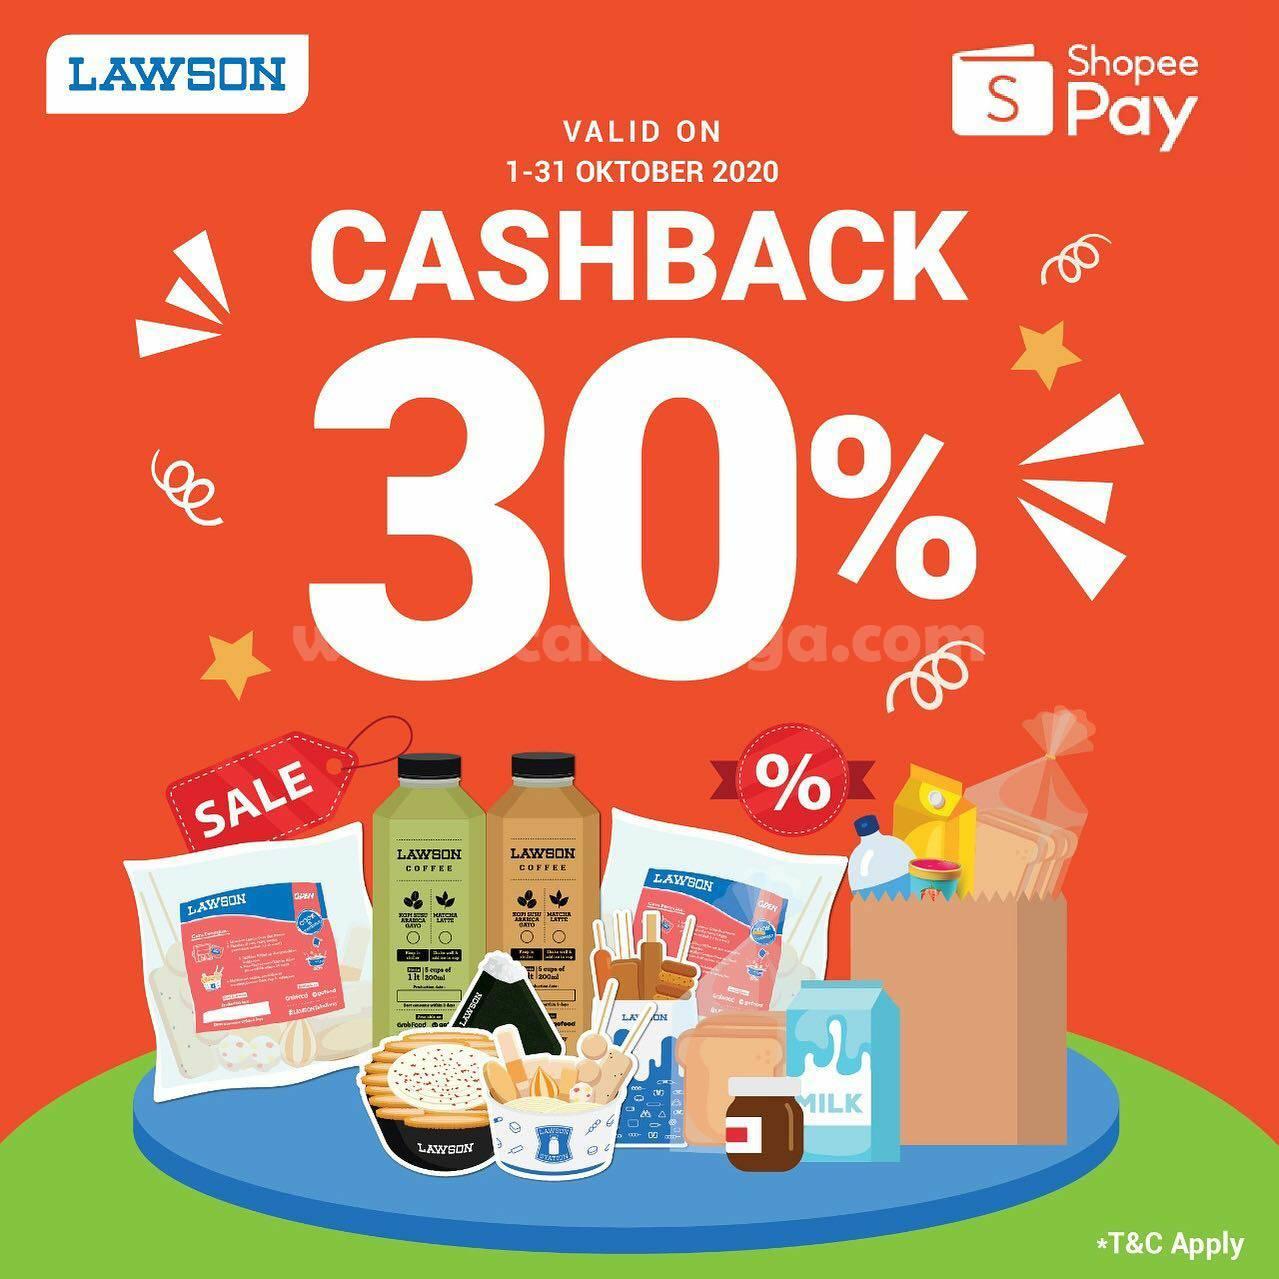 Promo LAWSON CASHBACK 30% untuk Transaksi Menggunakan SHOPEEPAY